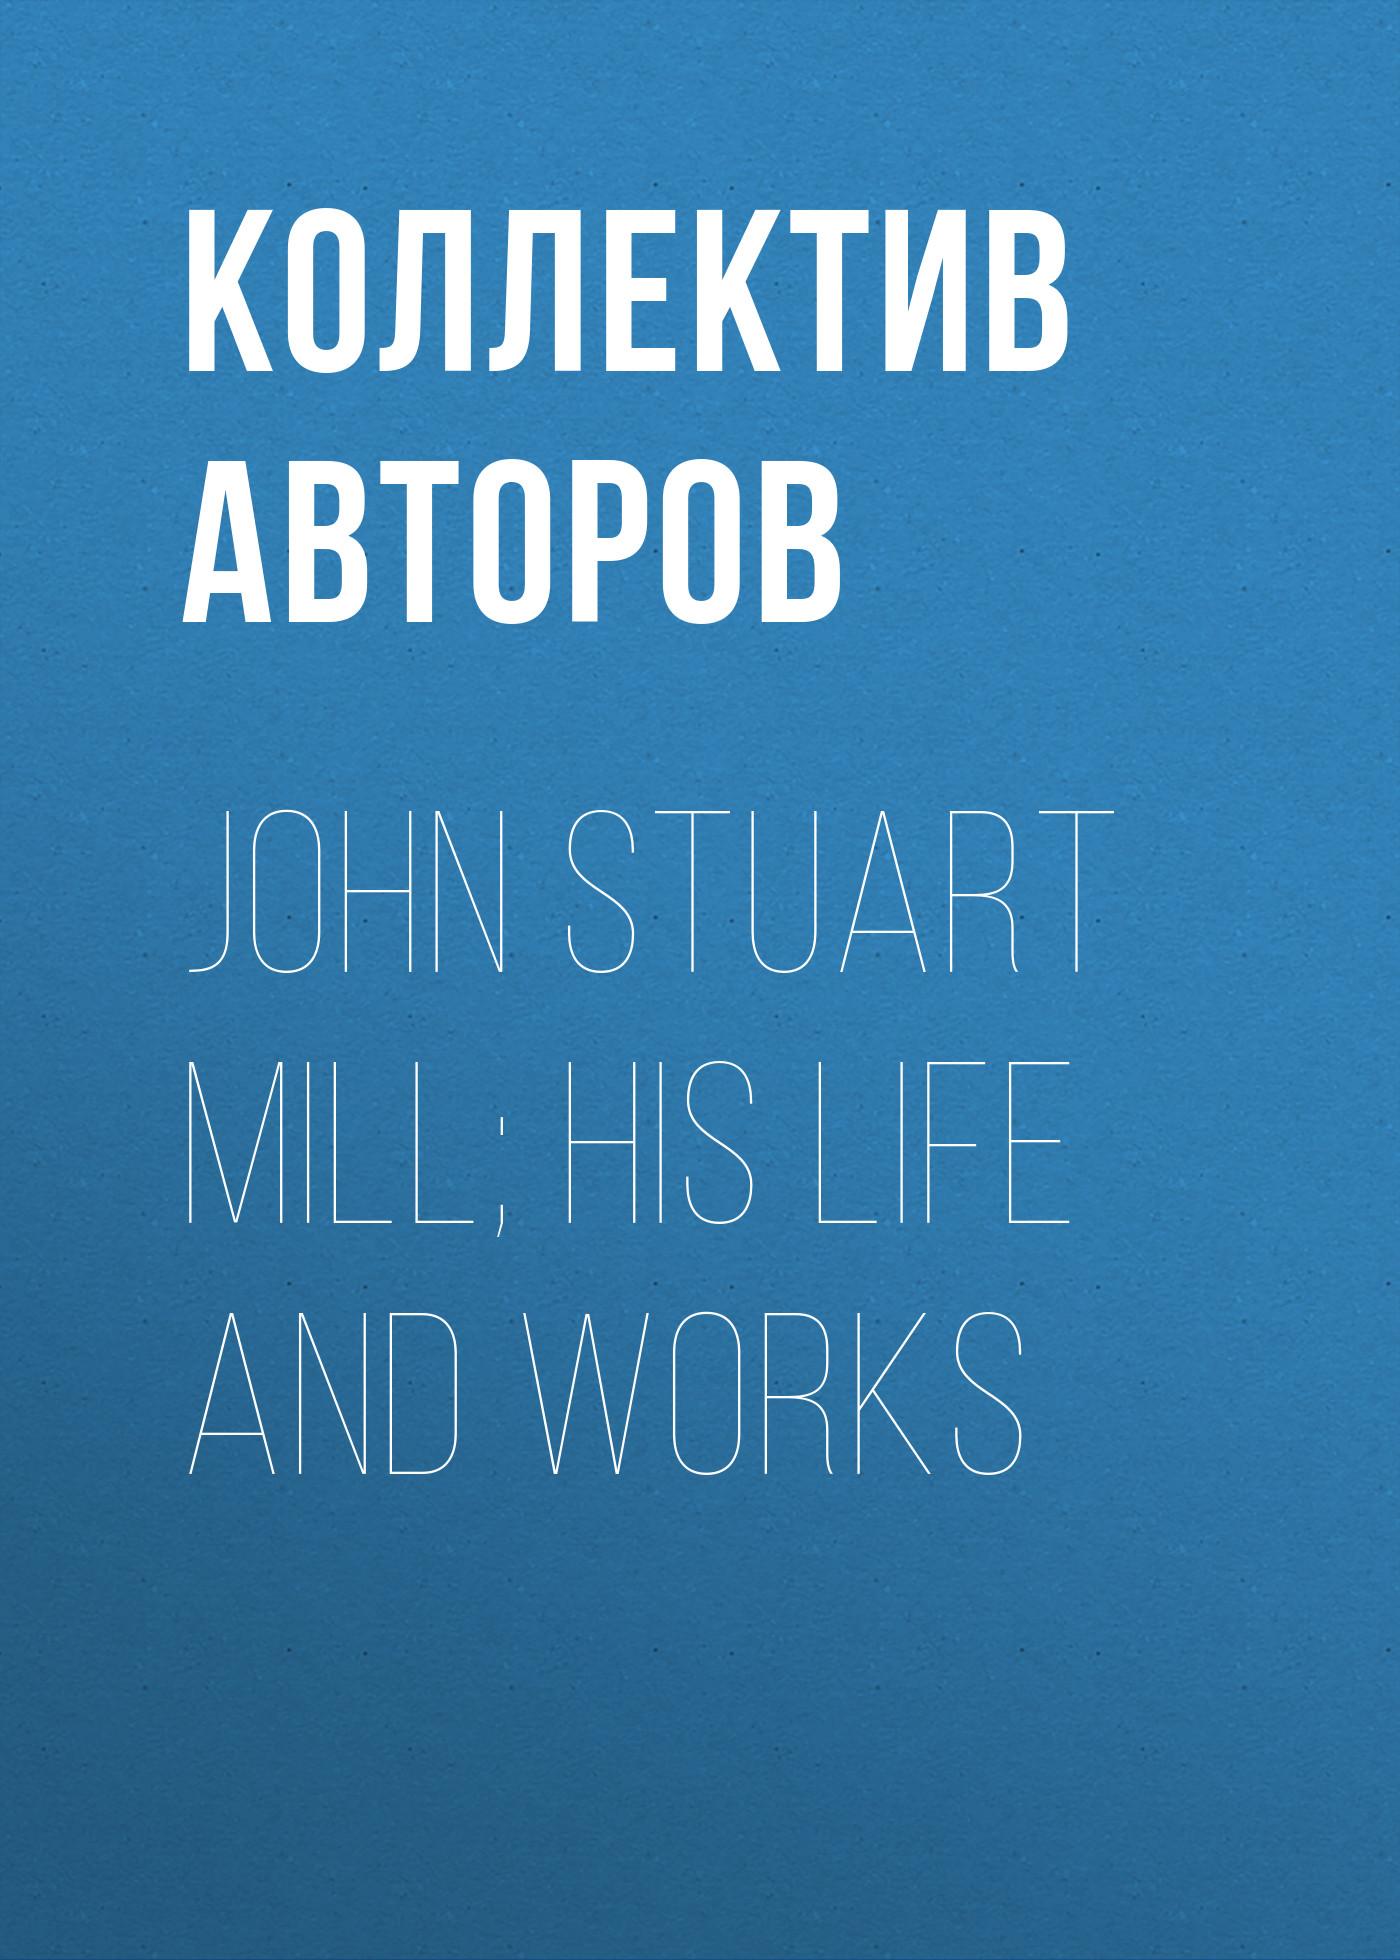 Коллектив авторов John Stuart Mill; His Life and Works john stuart mill principles of political economy volume 2